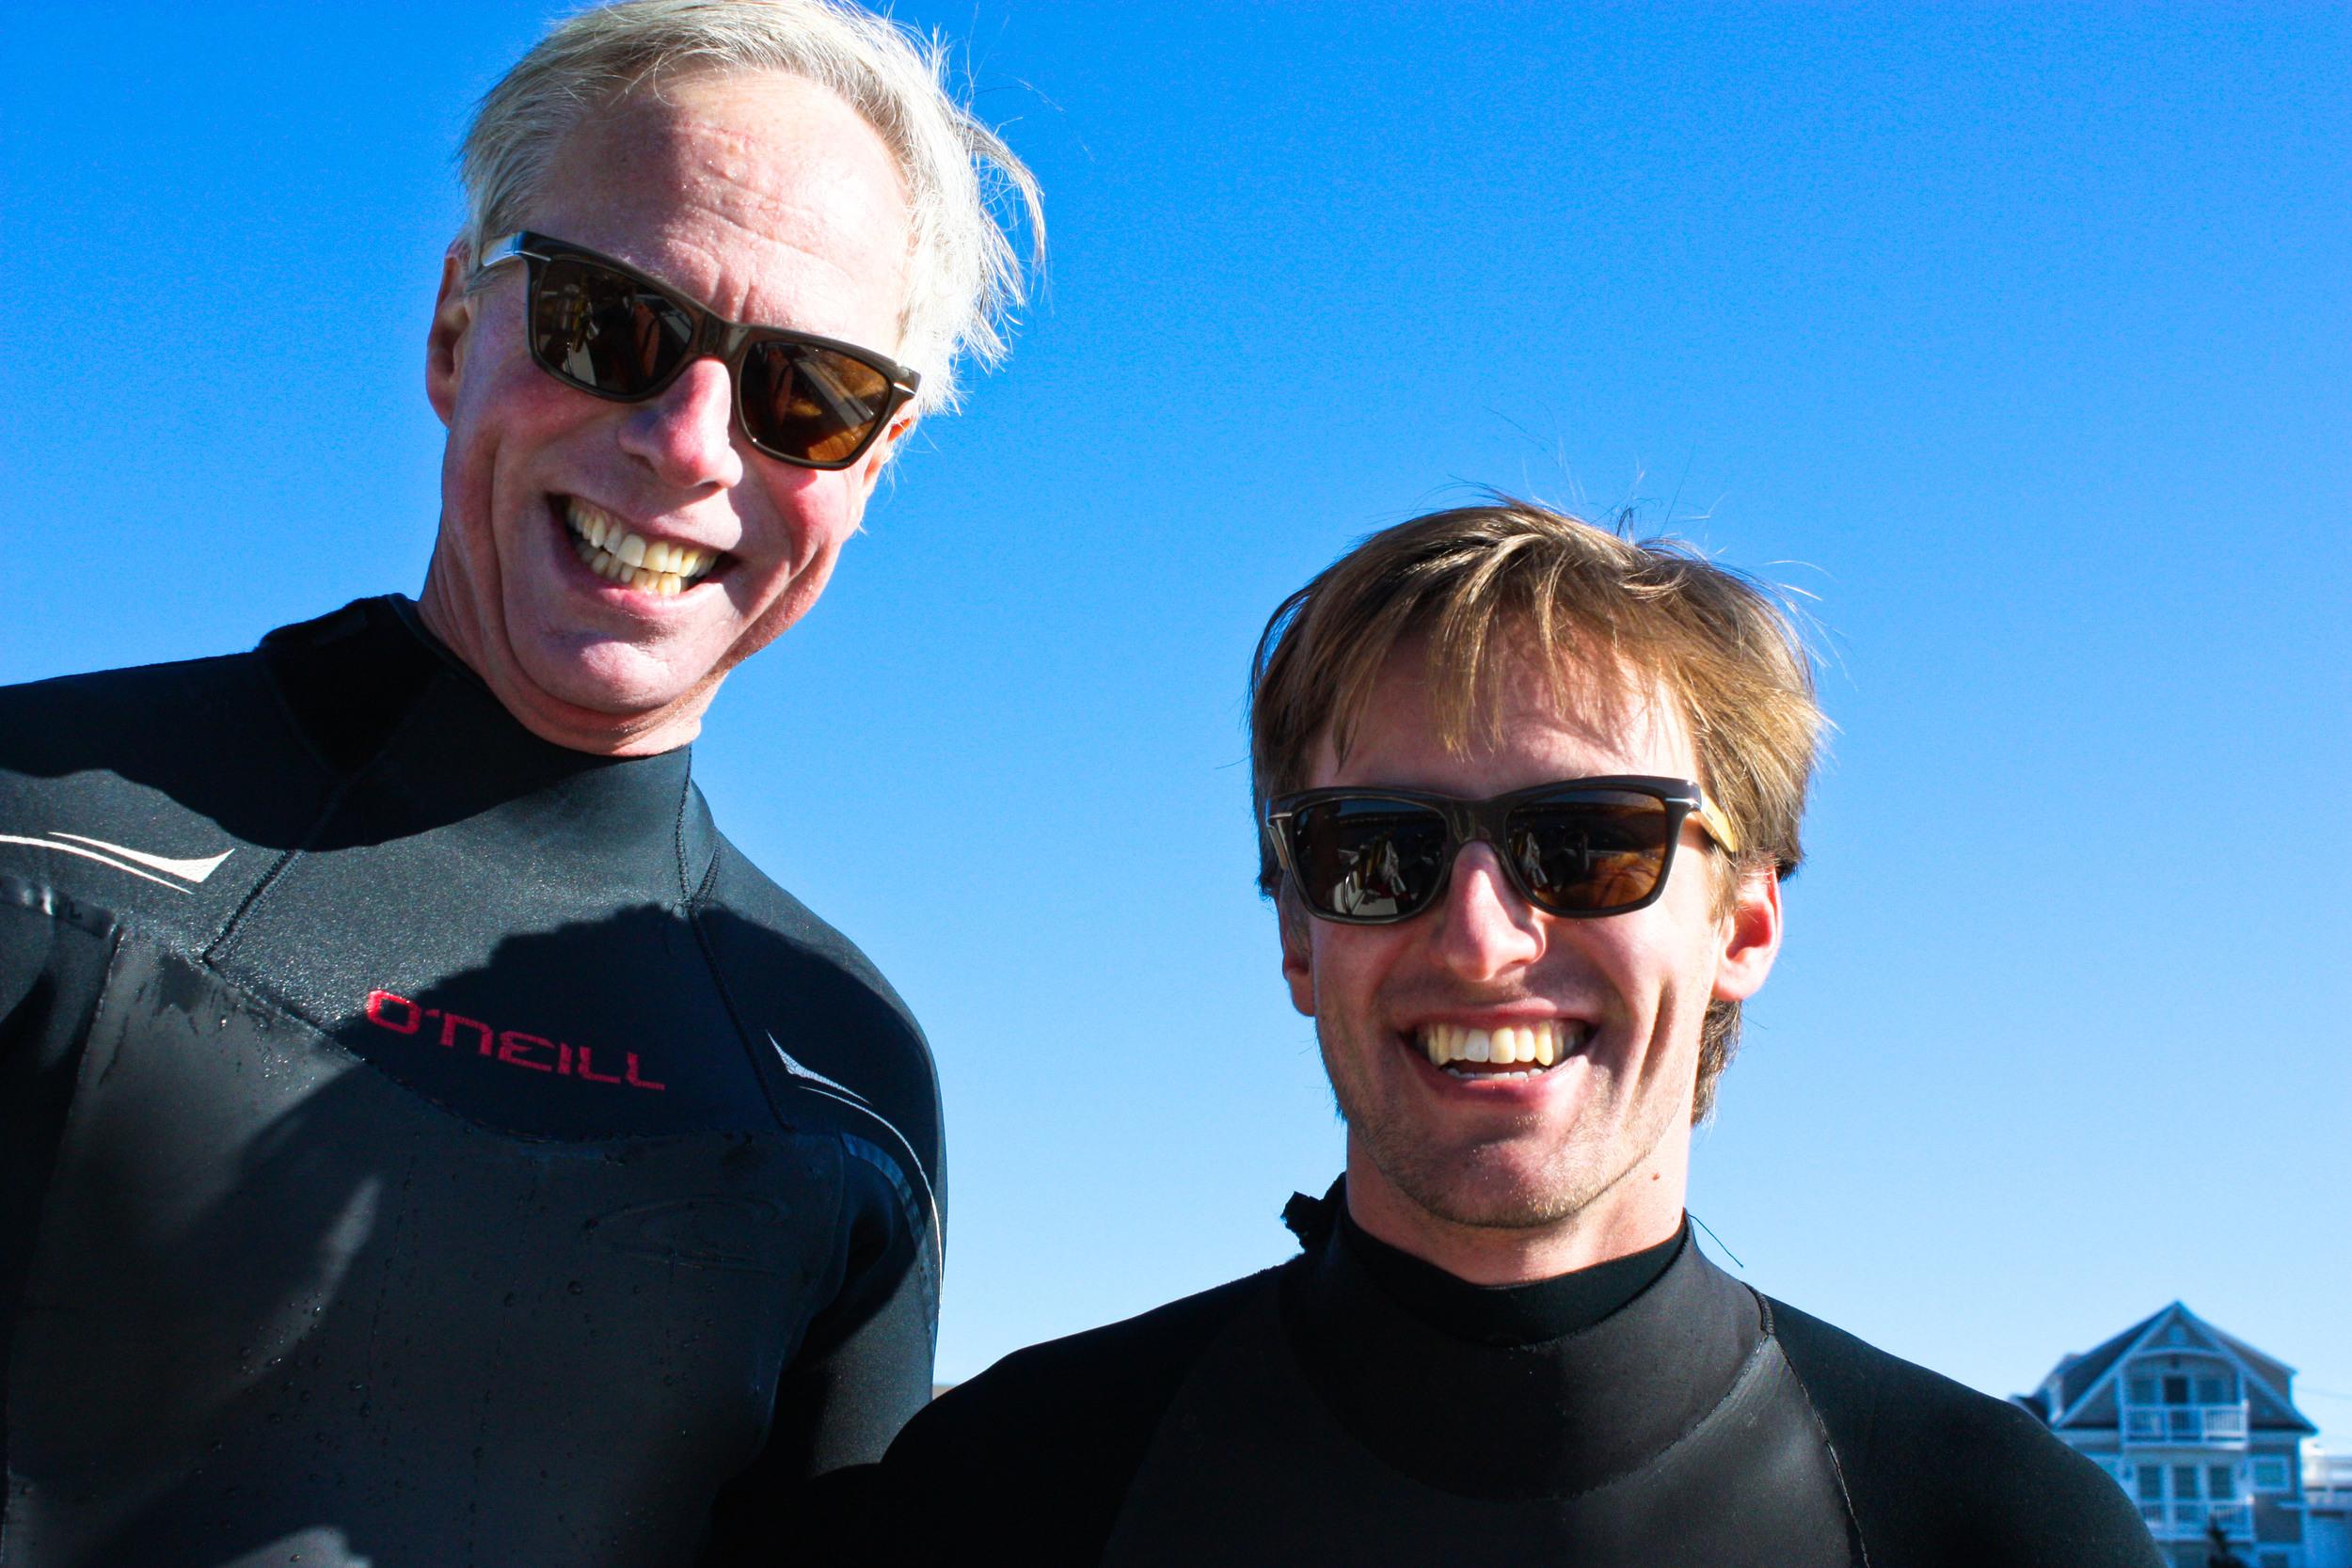 jim and john in alue sunglasses